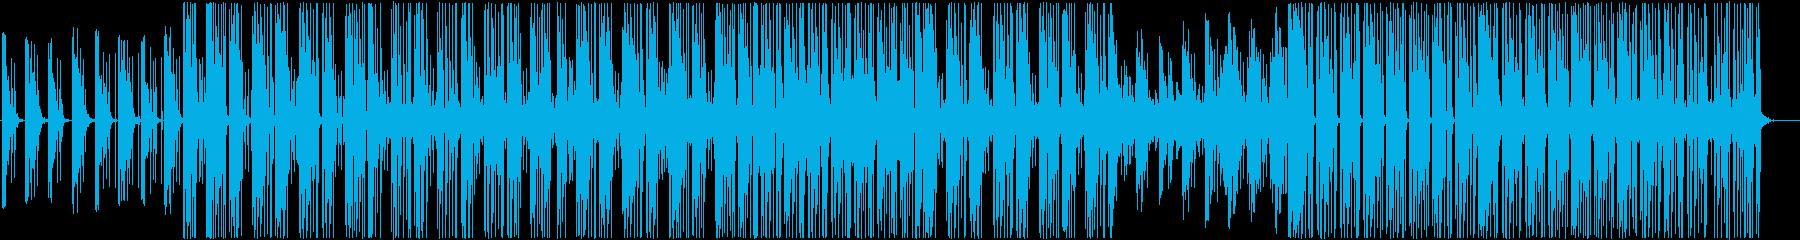 90's洋楽ドラムンベース 都会の孤独感の再生済みの波形